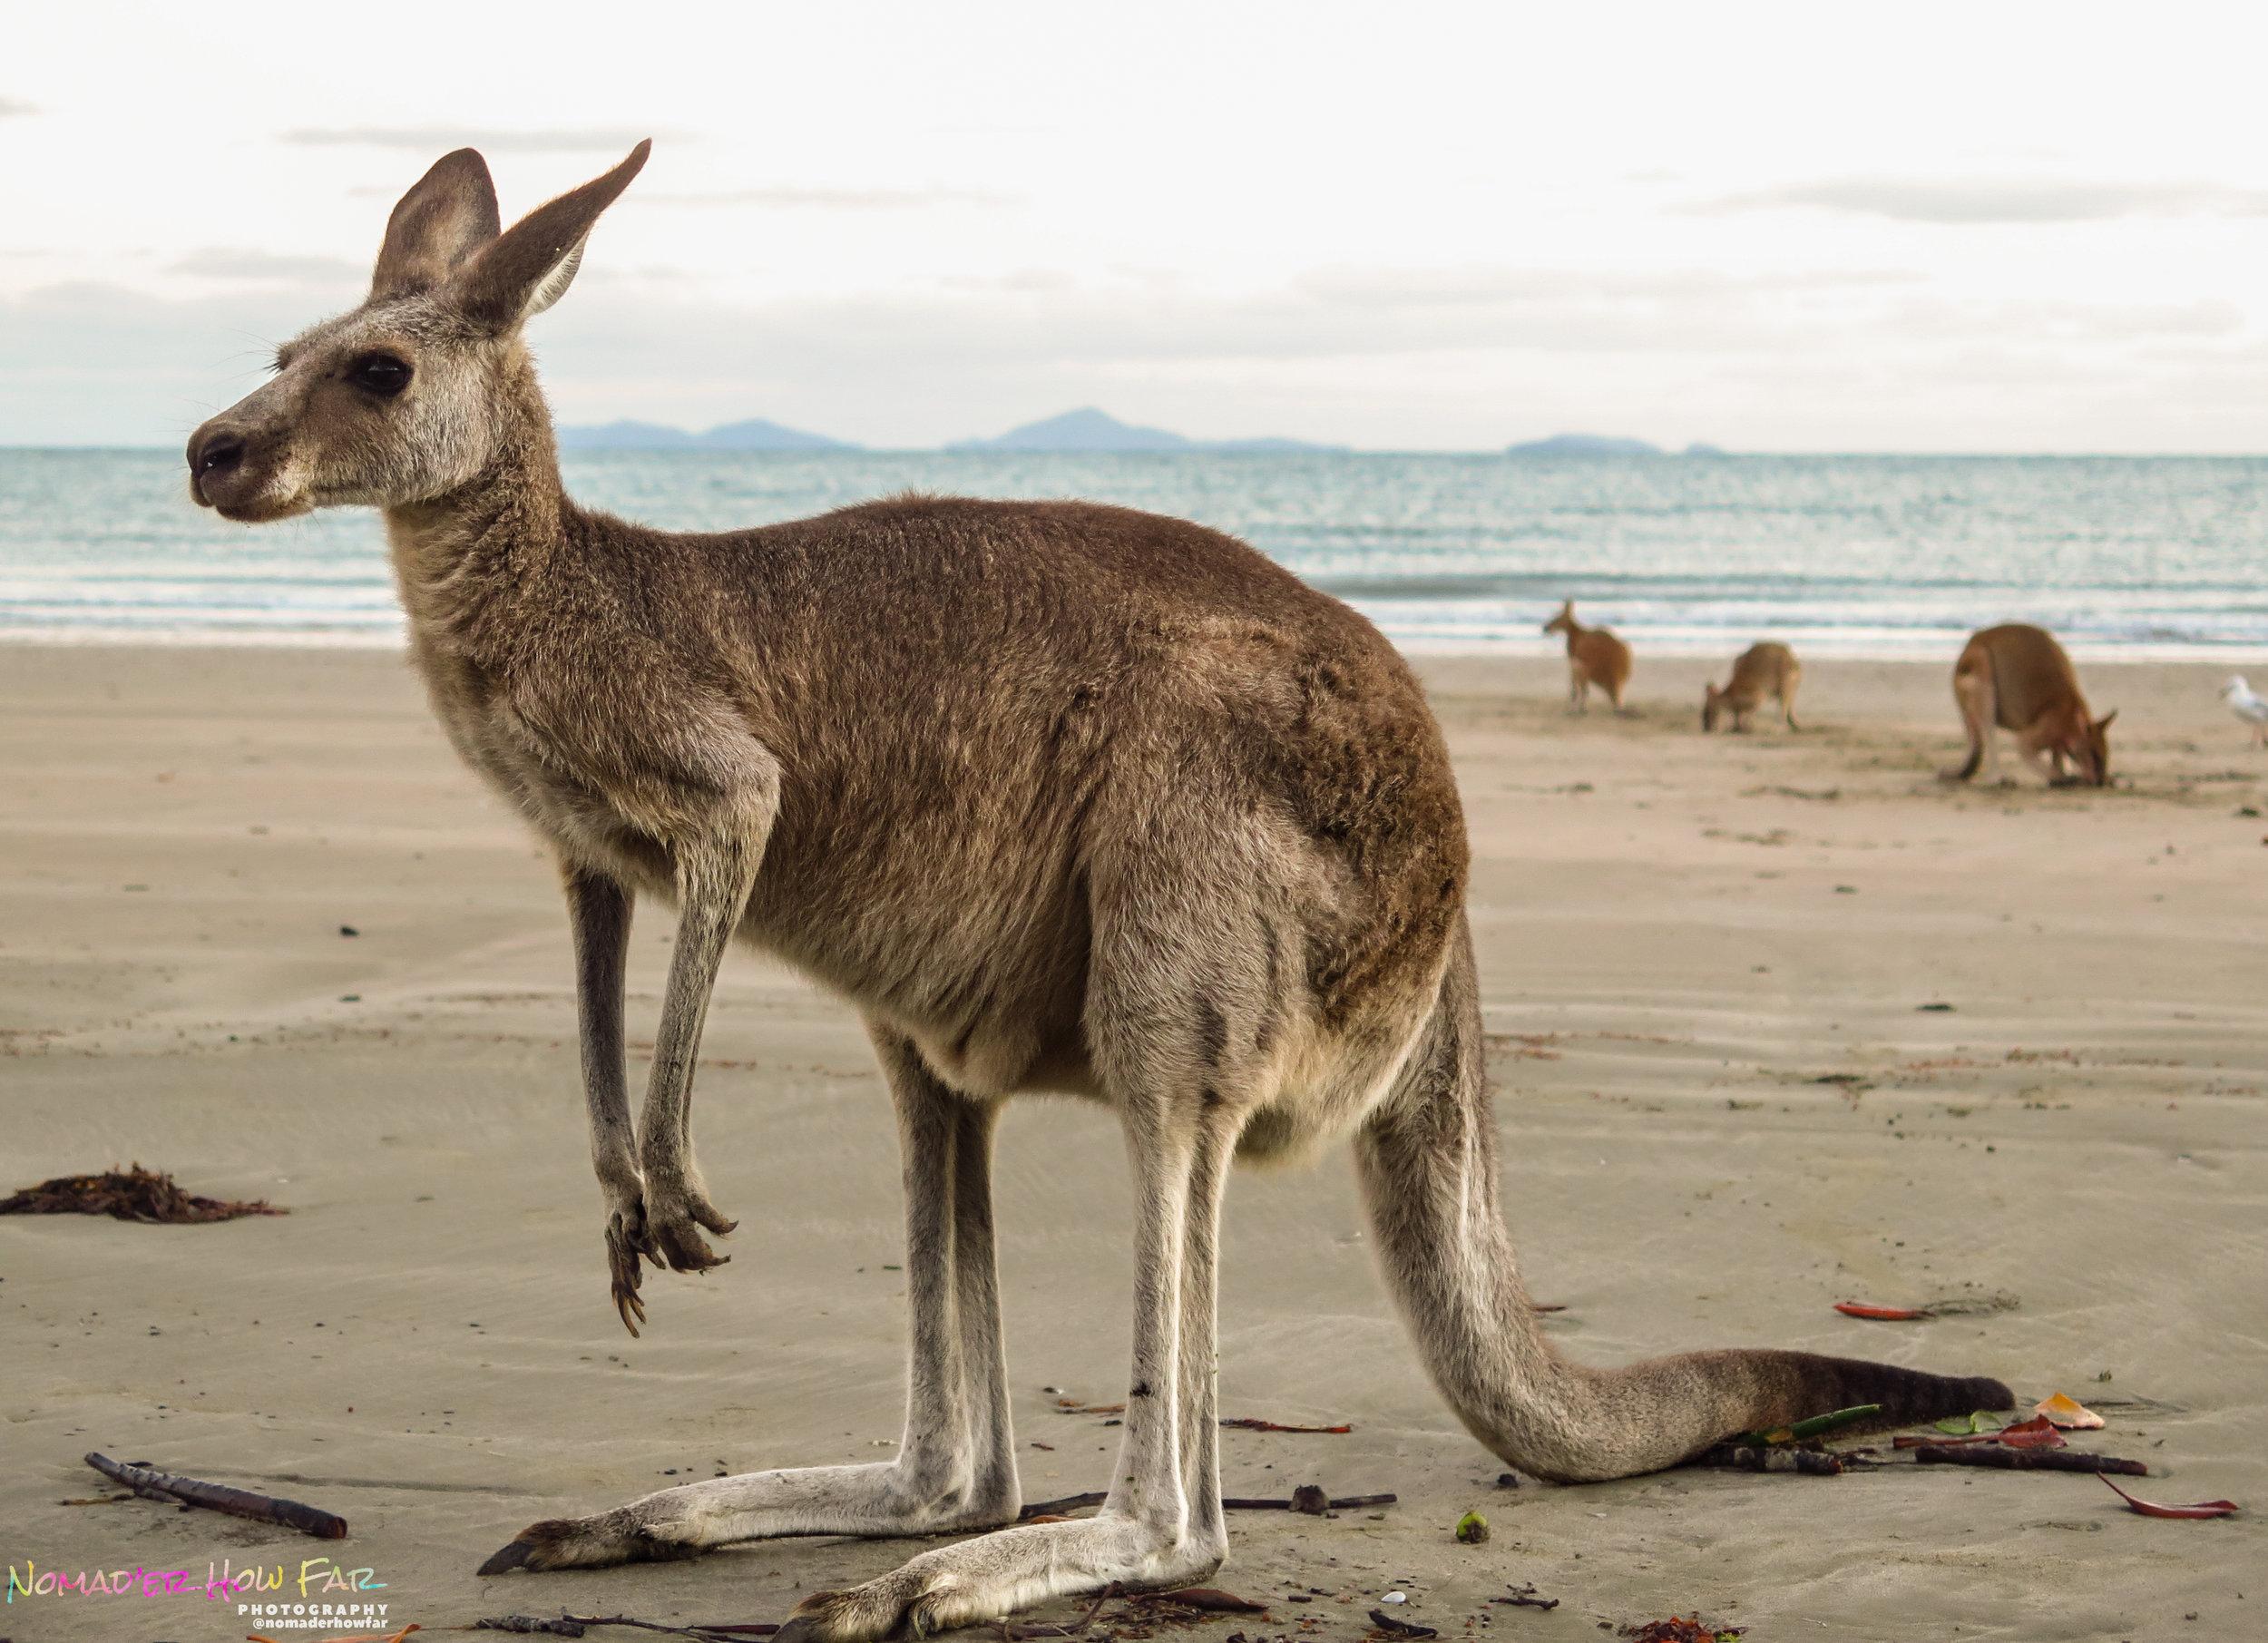 Posing kangaroo, Australia